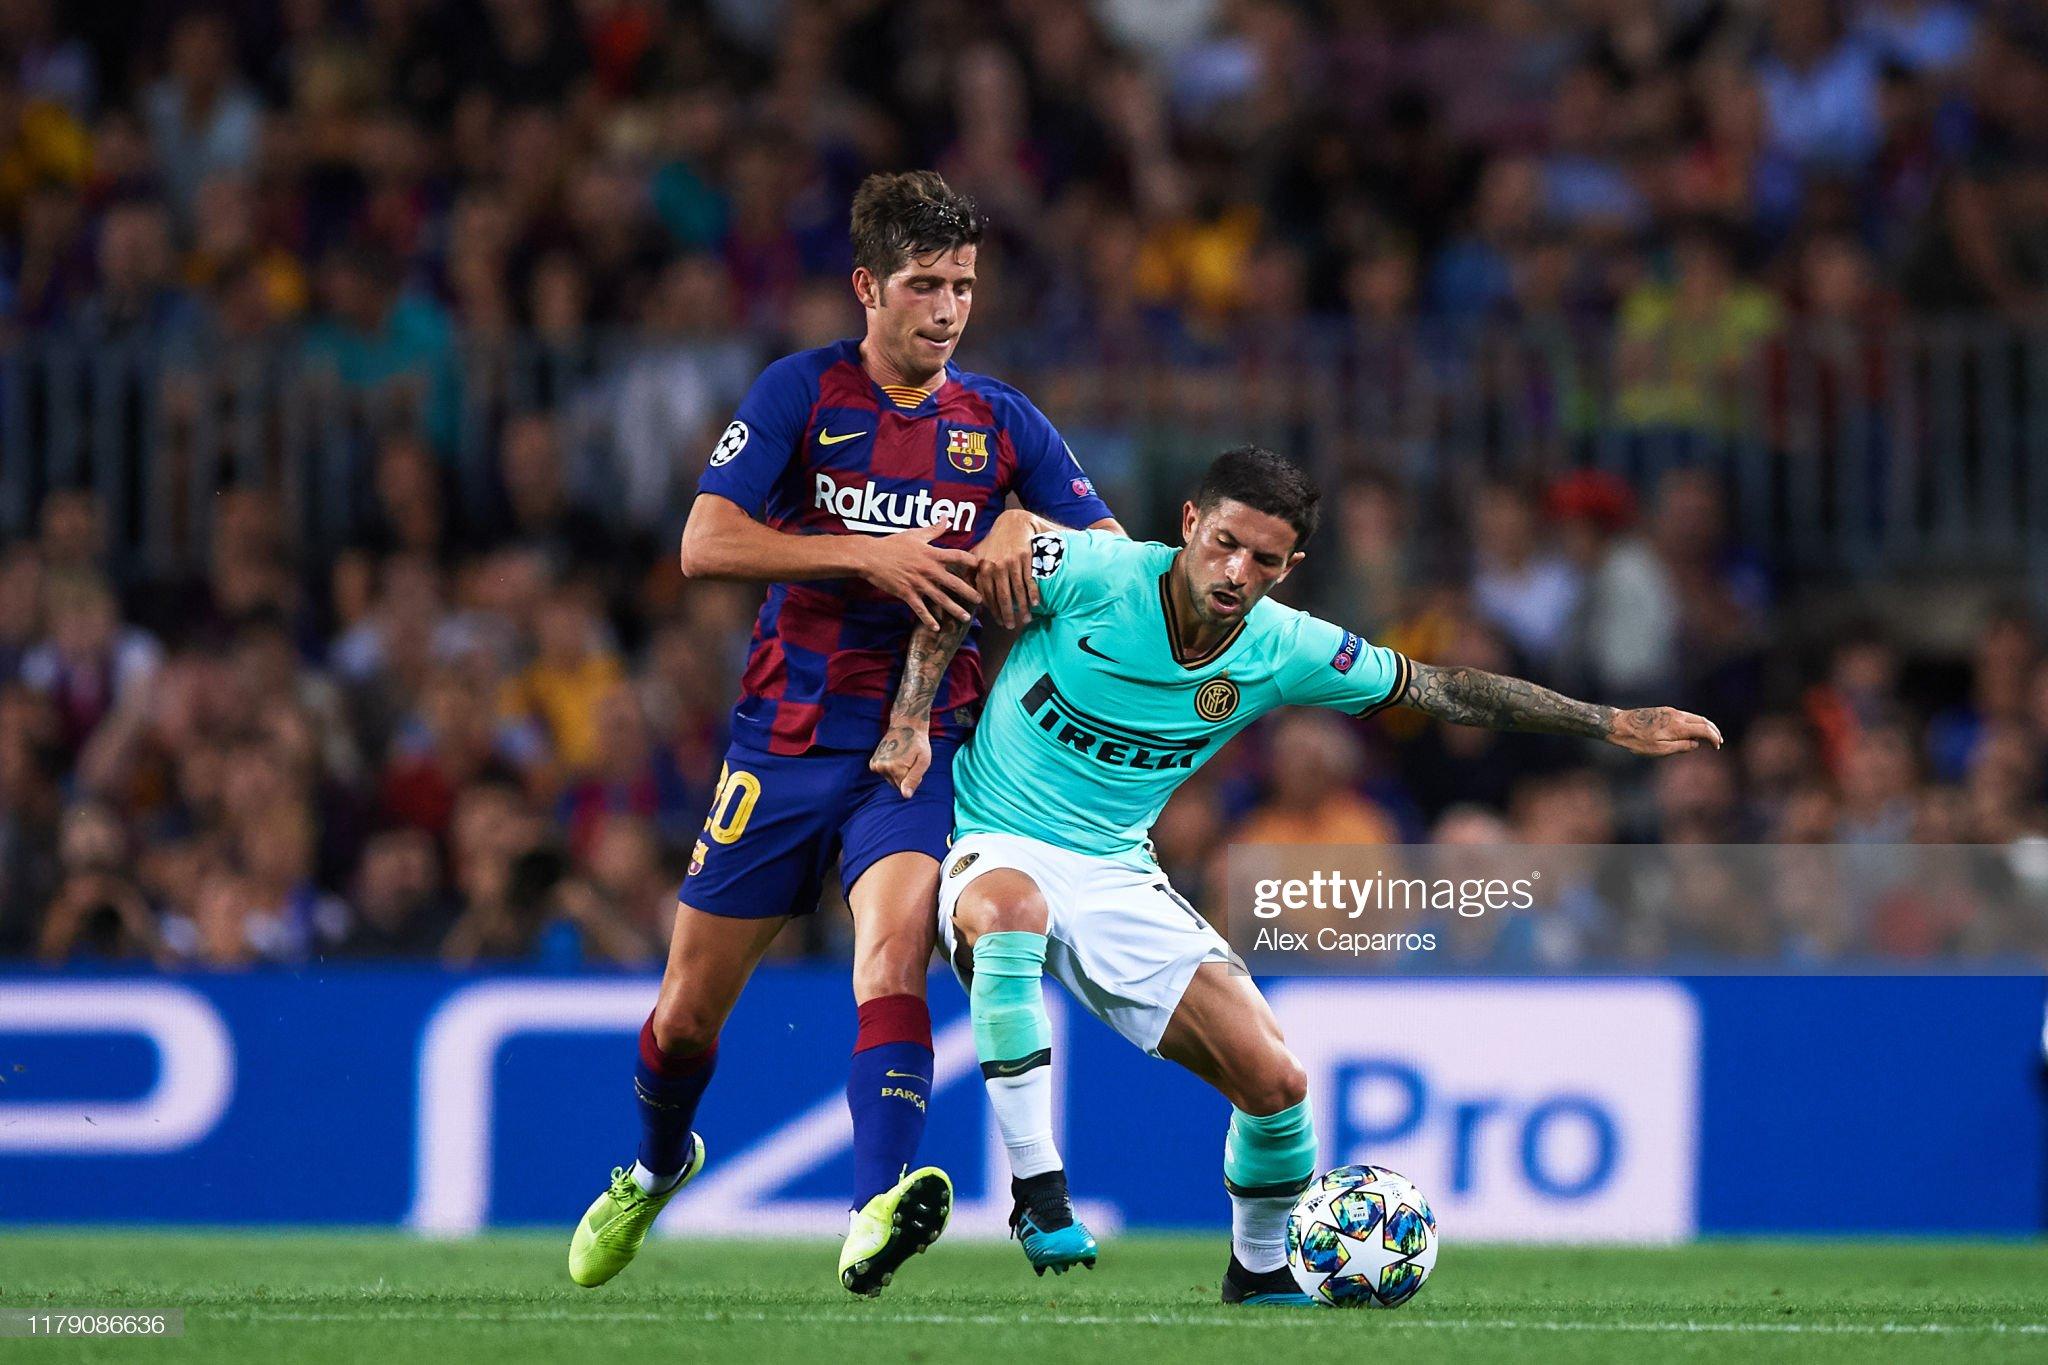 صور مباراة : برشلونة - إنتر 2-1 ( 02-10-2019 )  Stefano-sensi-of-inter-fights-for-the-ball-with-sergi-roberto-of-fc-picture-id1179086636?s=2048x2048